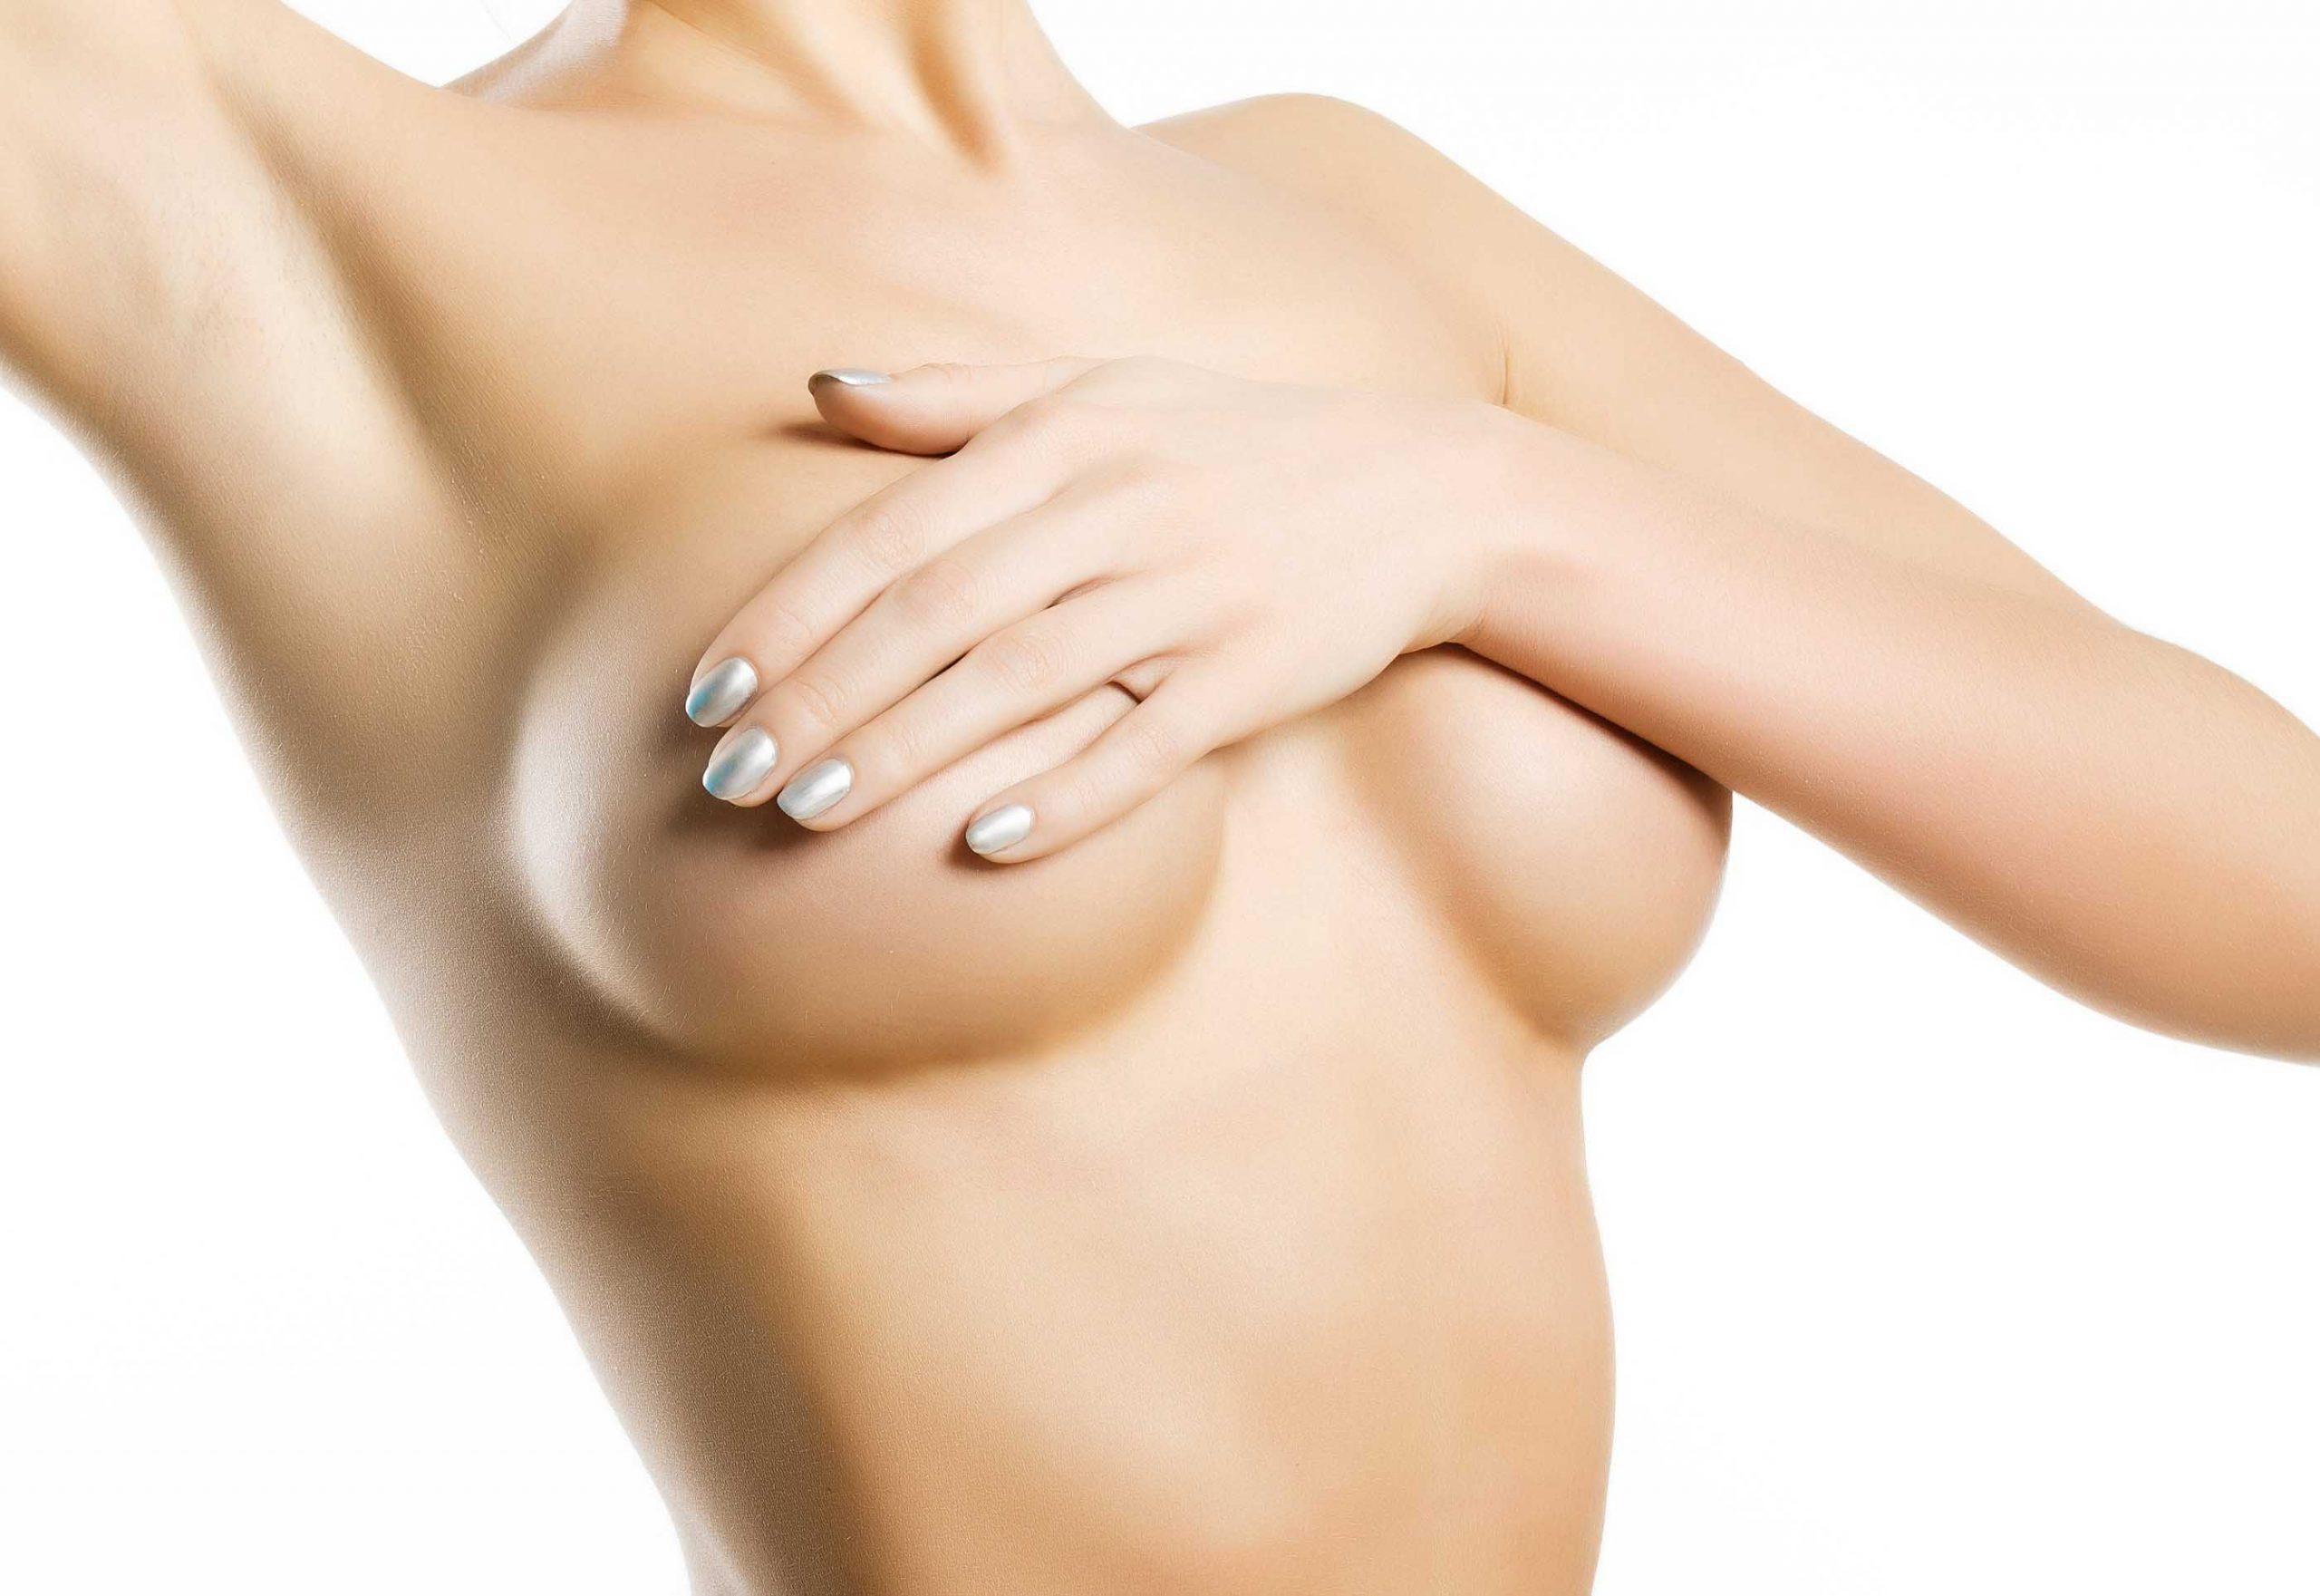 breast augmentation surgery in south korea